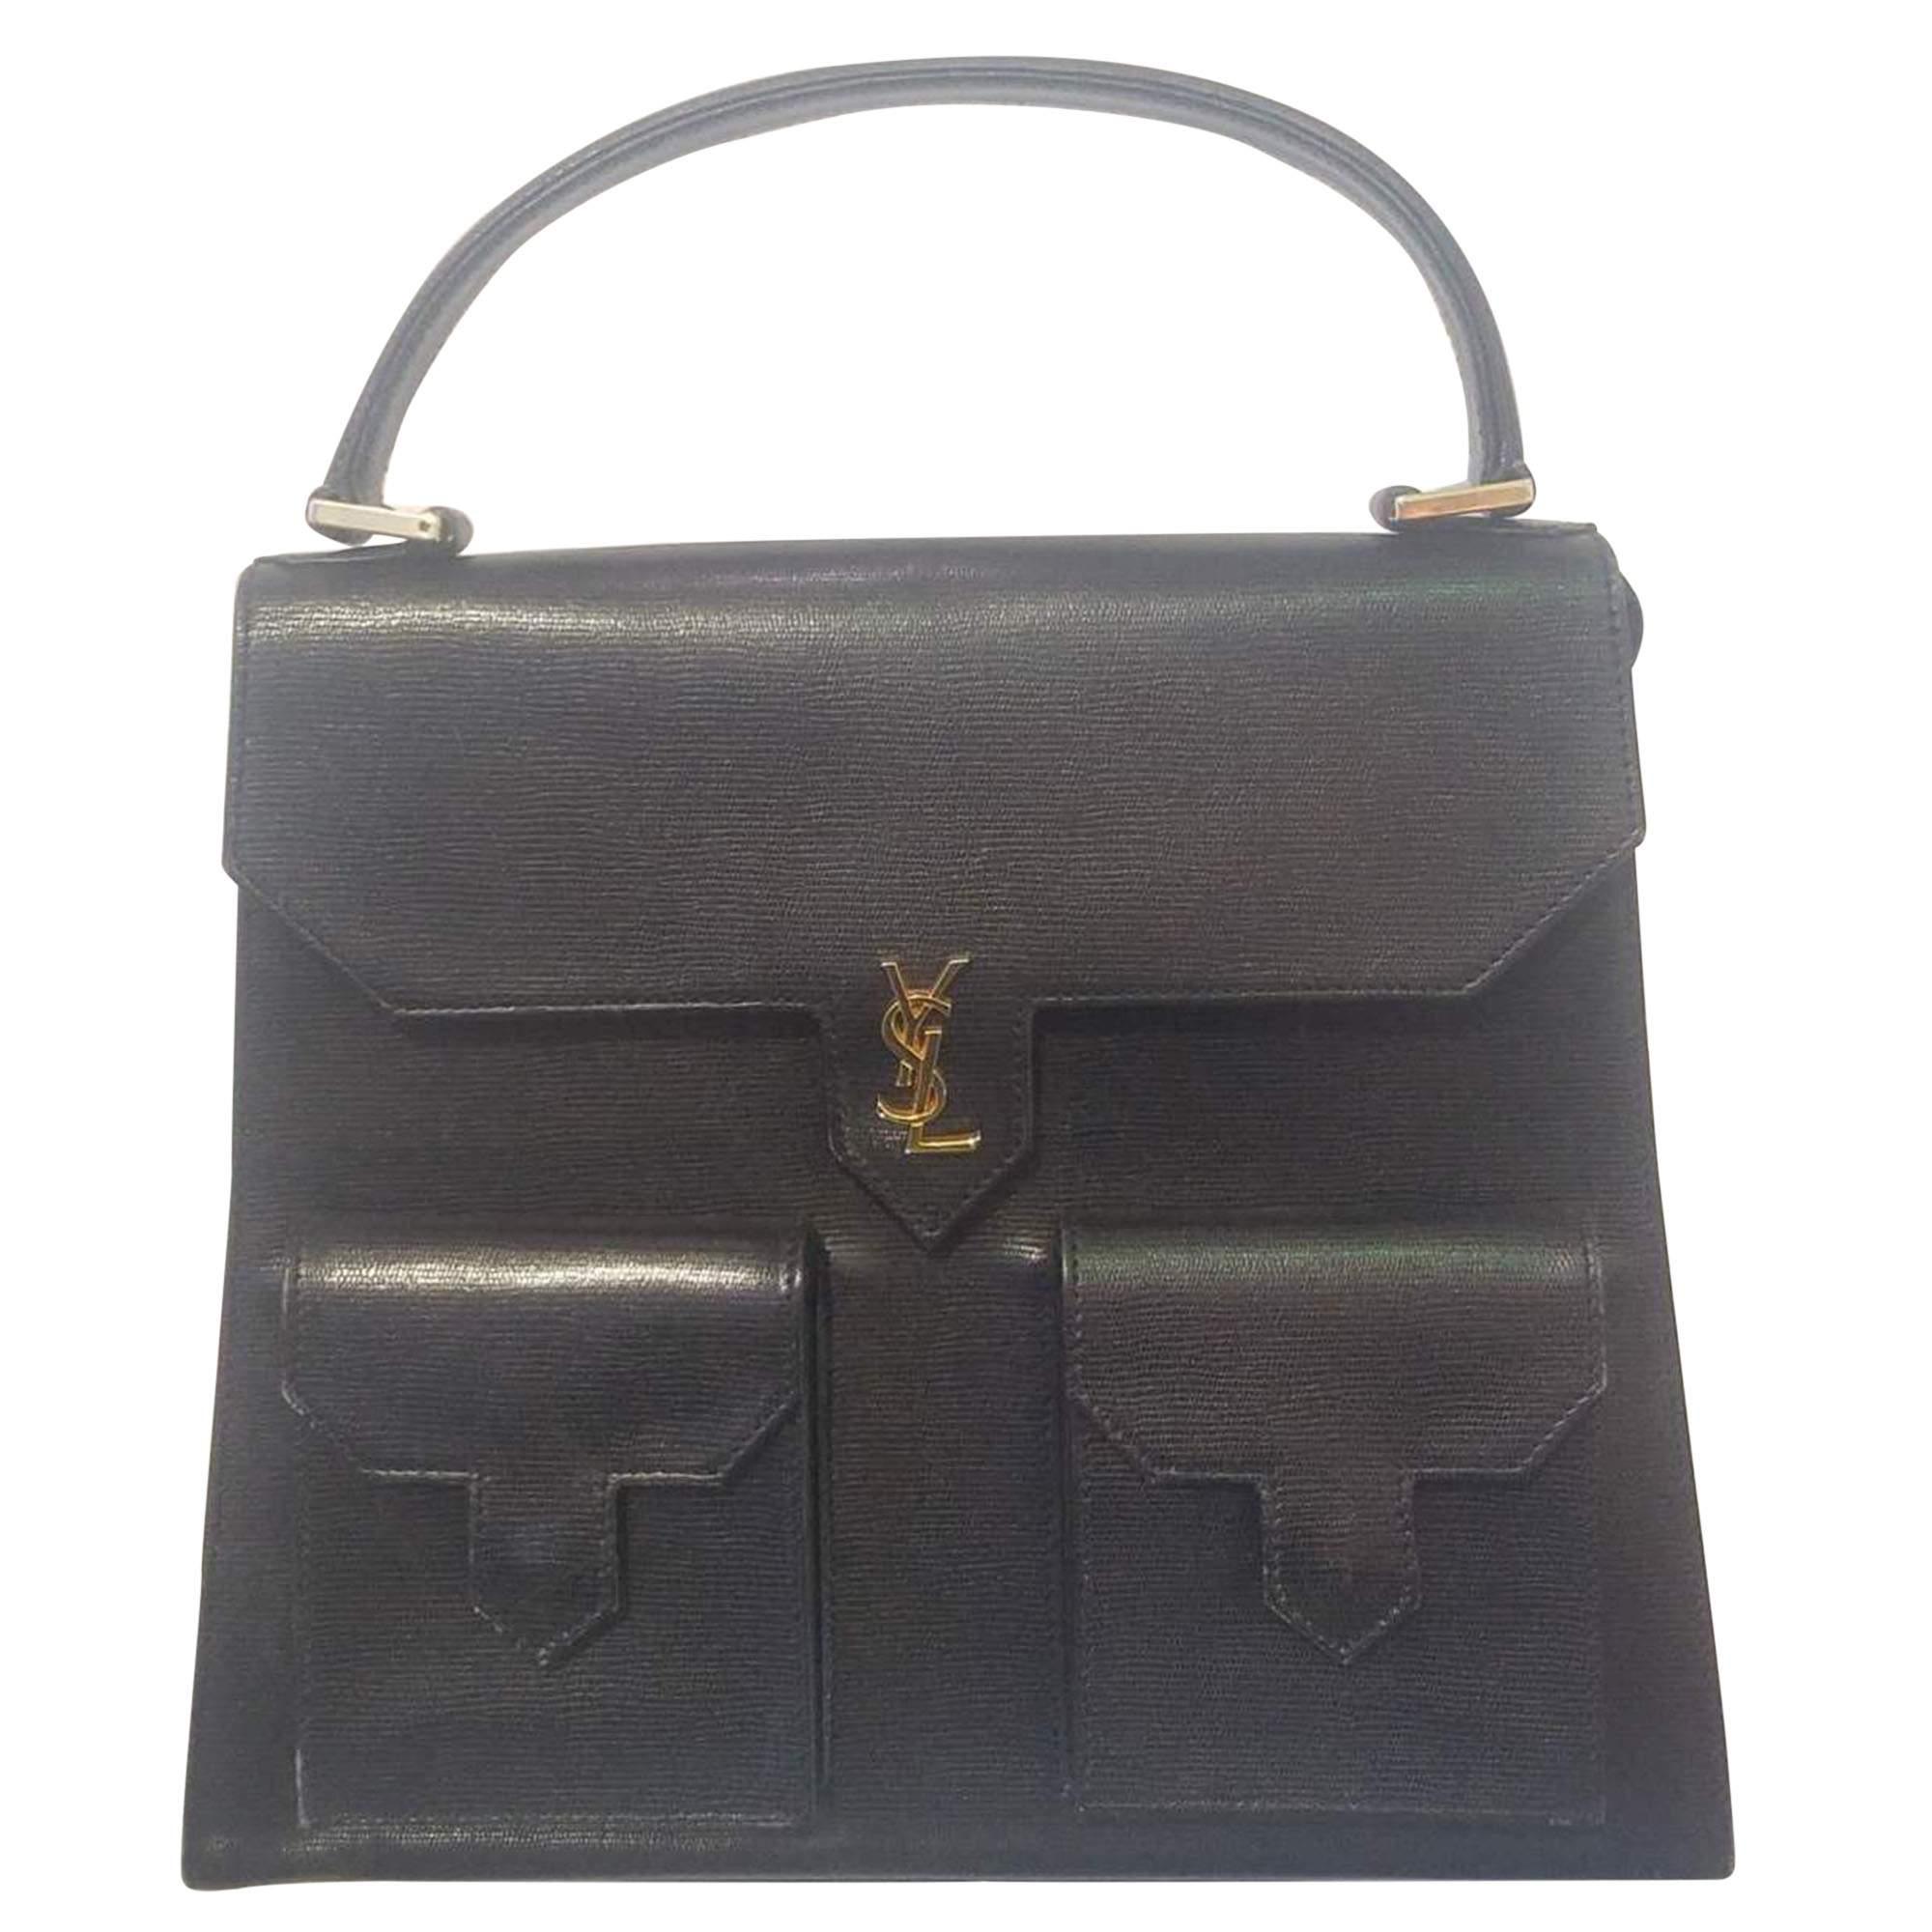 1c41796a65f St Laurent Vintage Yves Saint Laurent Top Handle Navy Bag | The Chic  Selection